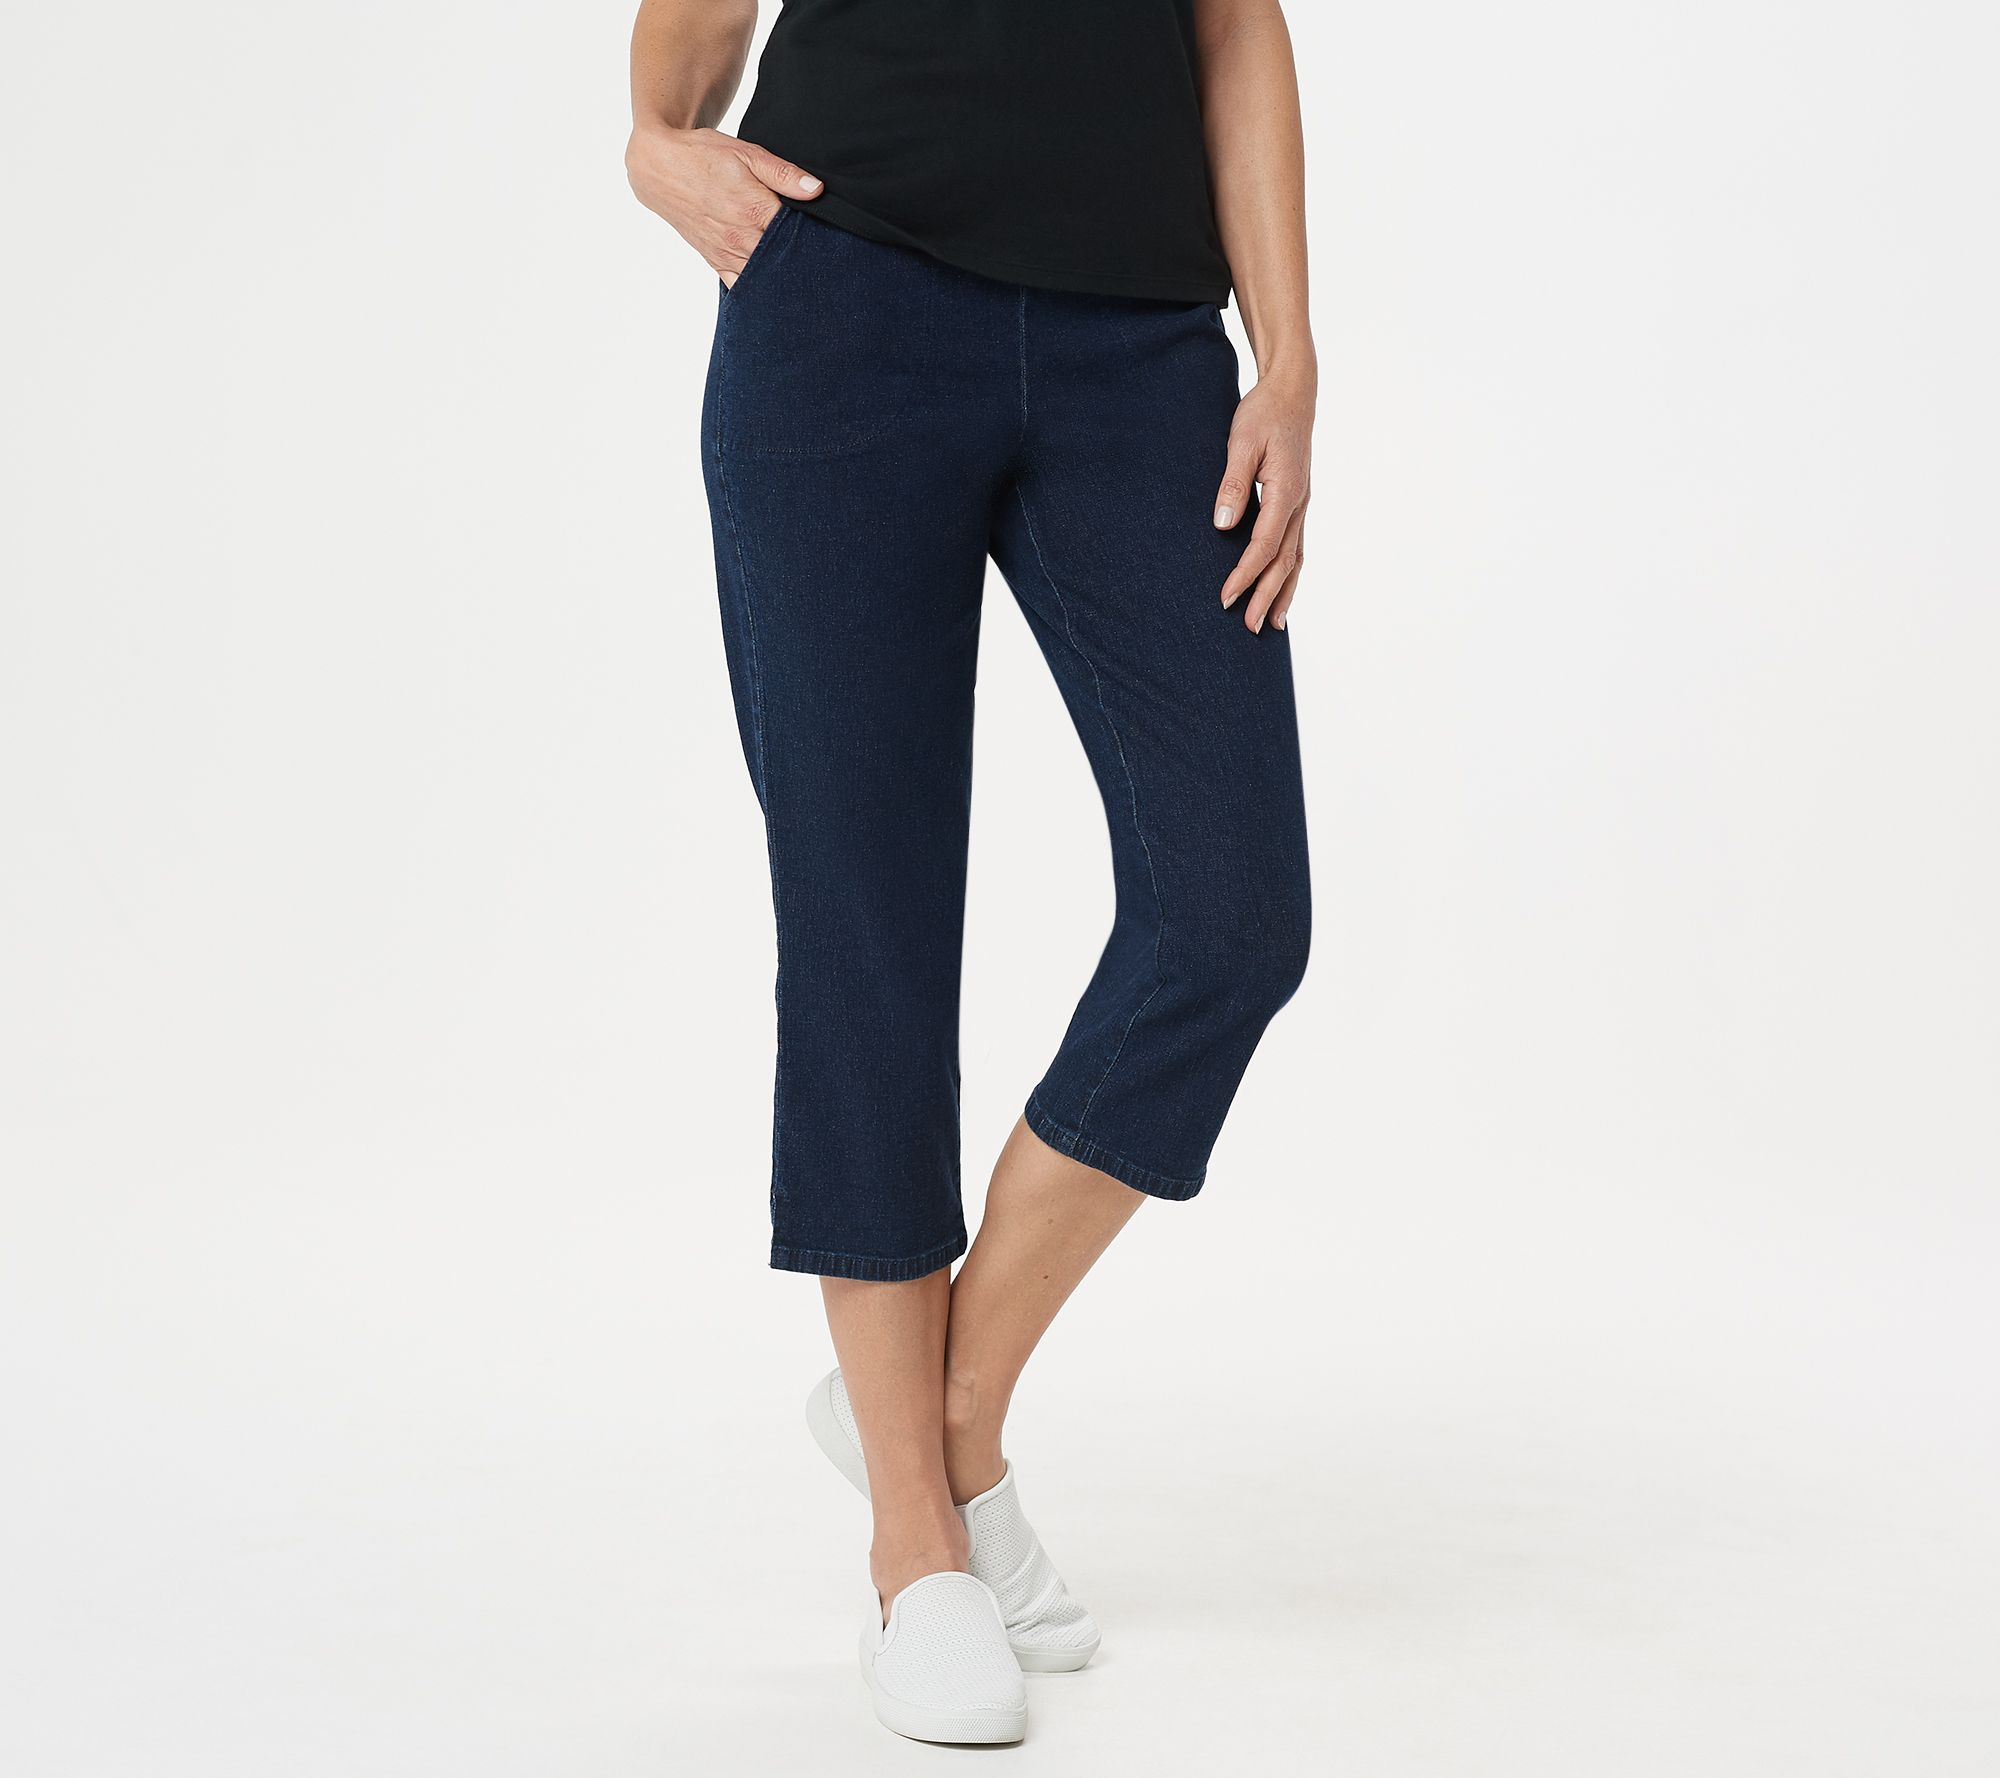 2bd1c975 Original Waist Stretch Crop Pants with Side Pockets - Page 1 — QVC.com